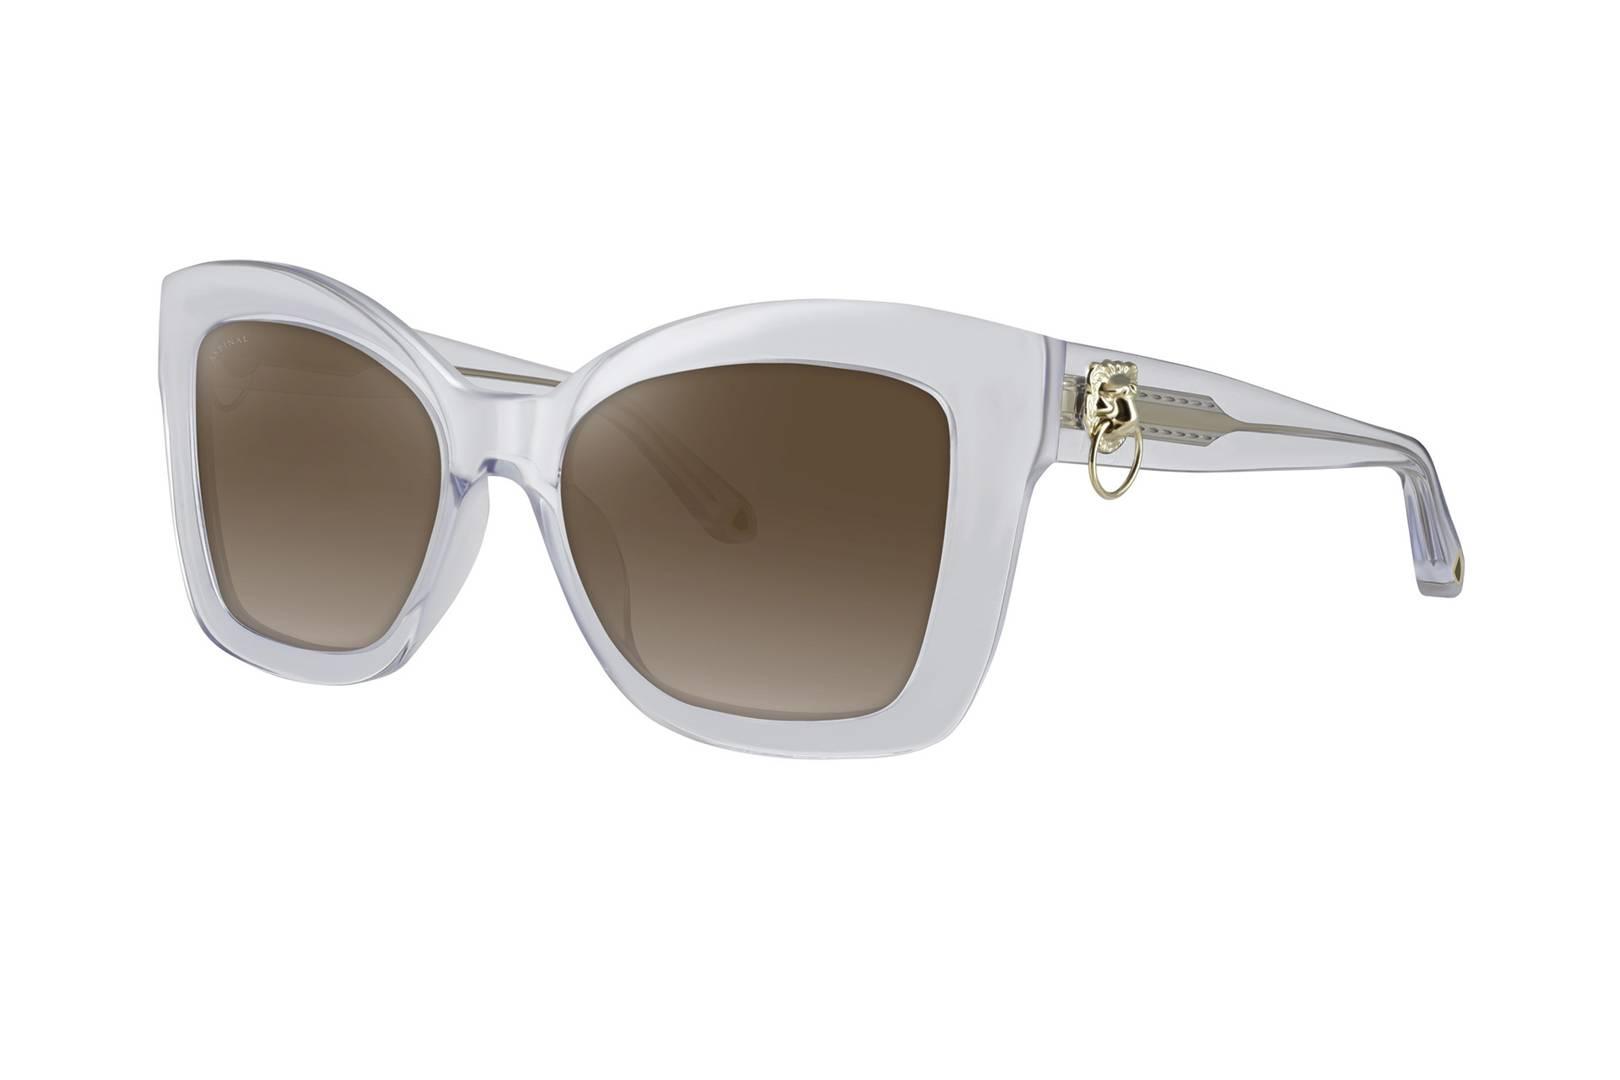 adbad6bdf Aspinal of London sunglasses launch | Tatler